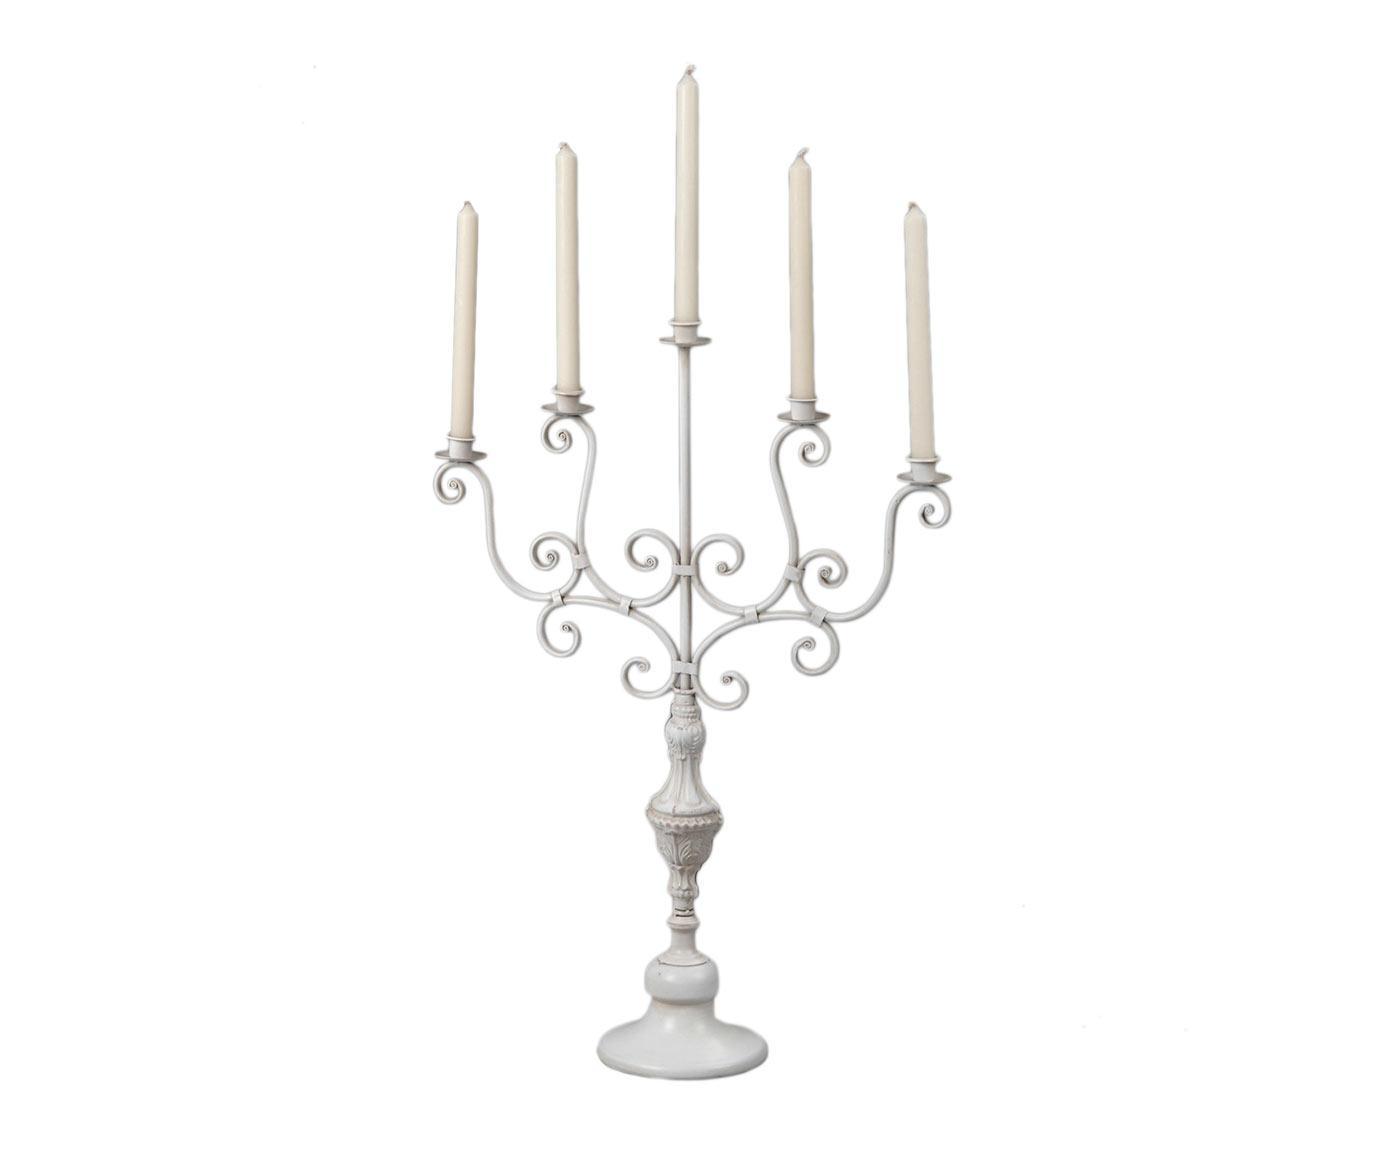 candelabro para decoracion de recepcion de bodas